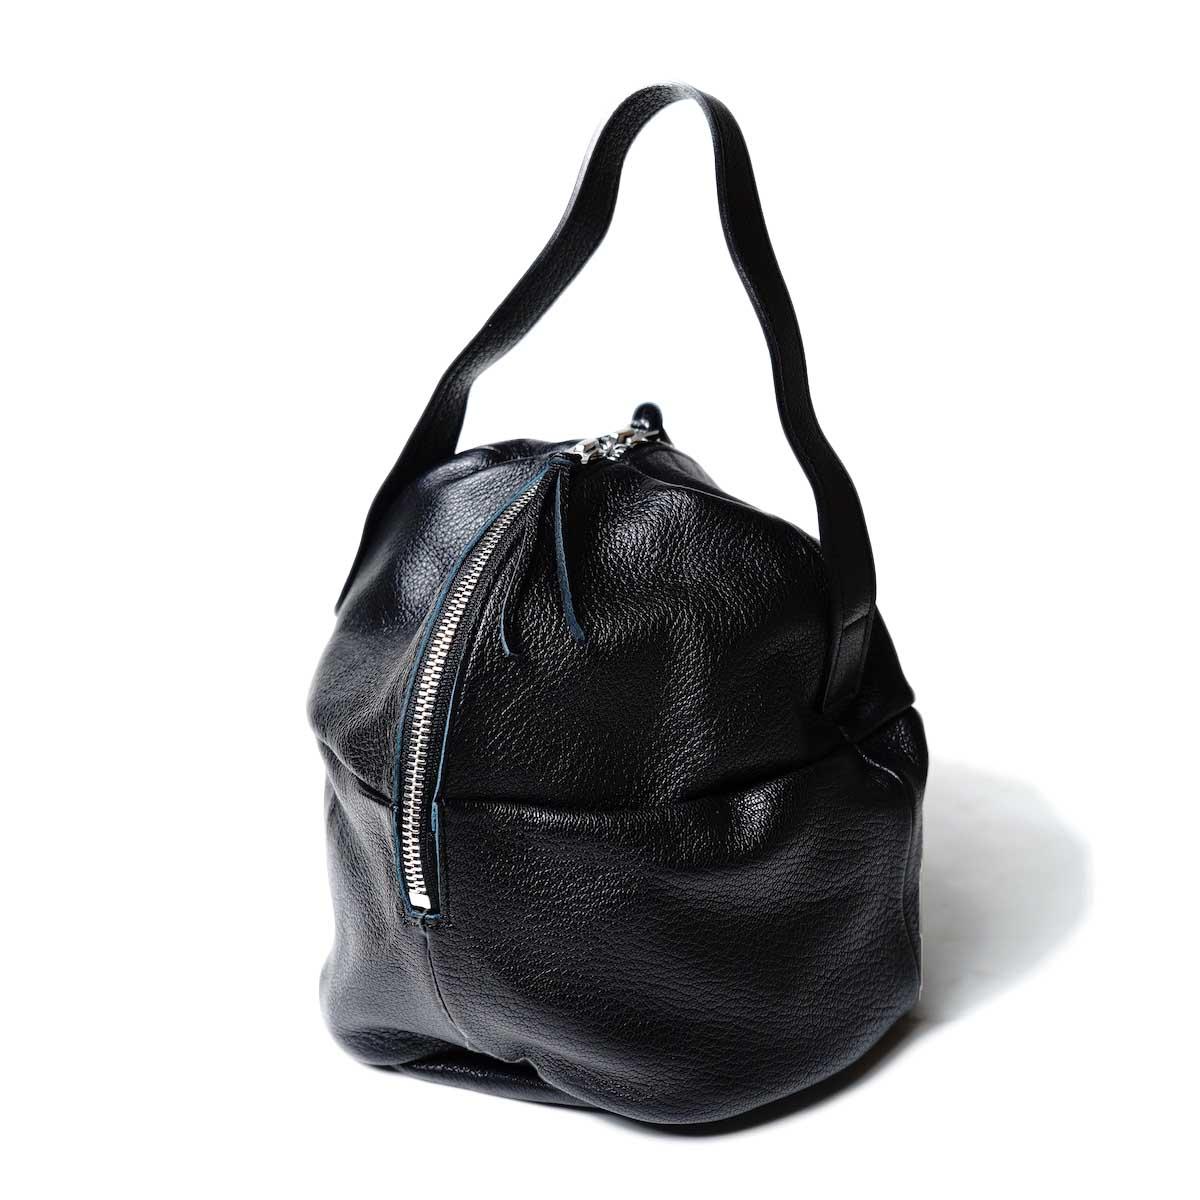 MYTHINKS / MY MINI DUFFLE BAG GOAT -Medium- (Black)